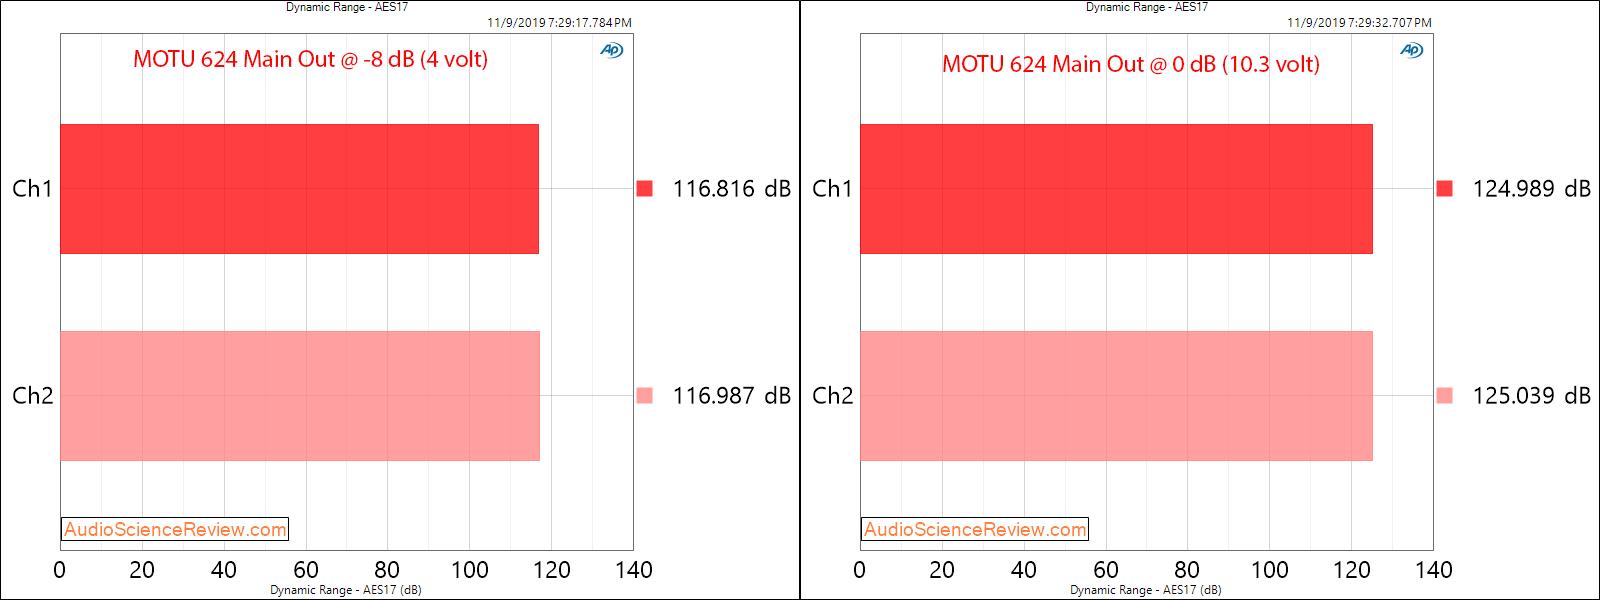 Motu 624 Pro Audio Interface DAC Dynamic Range Audio Measurements.png